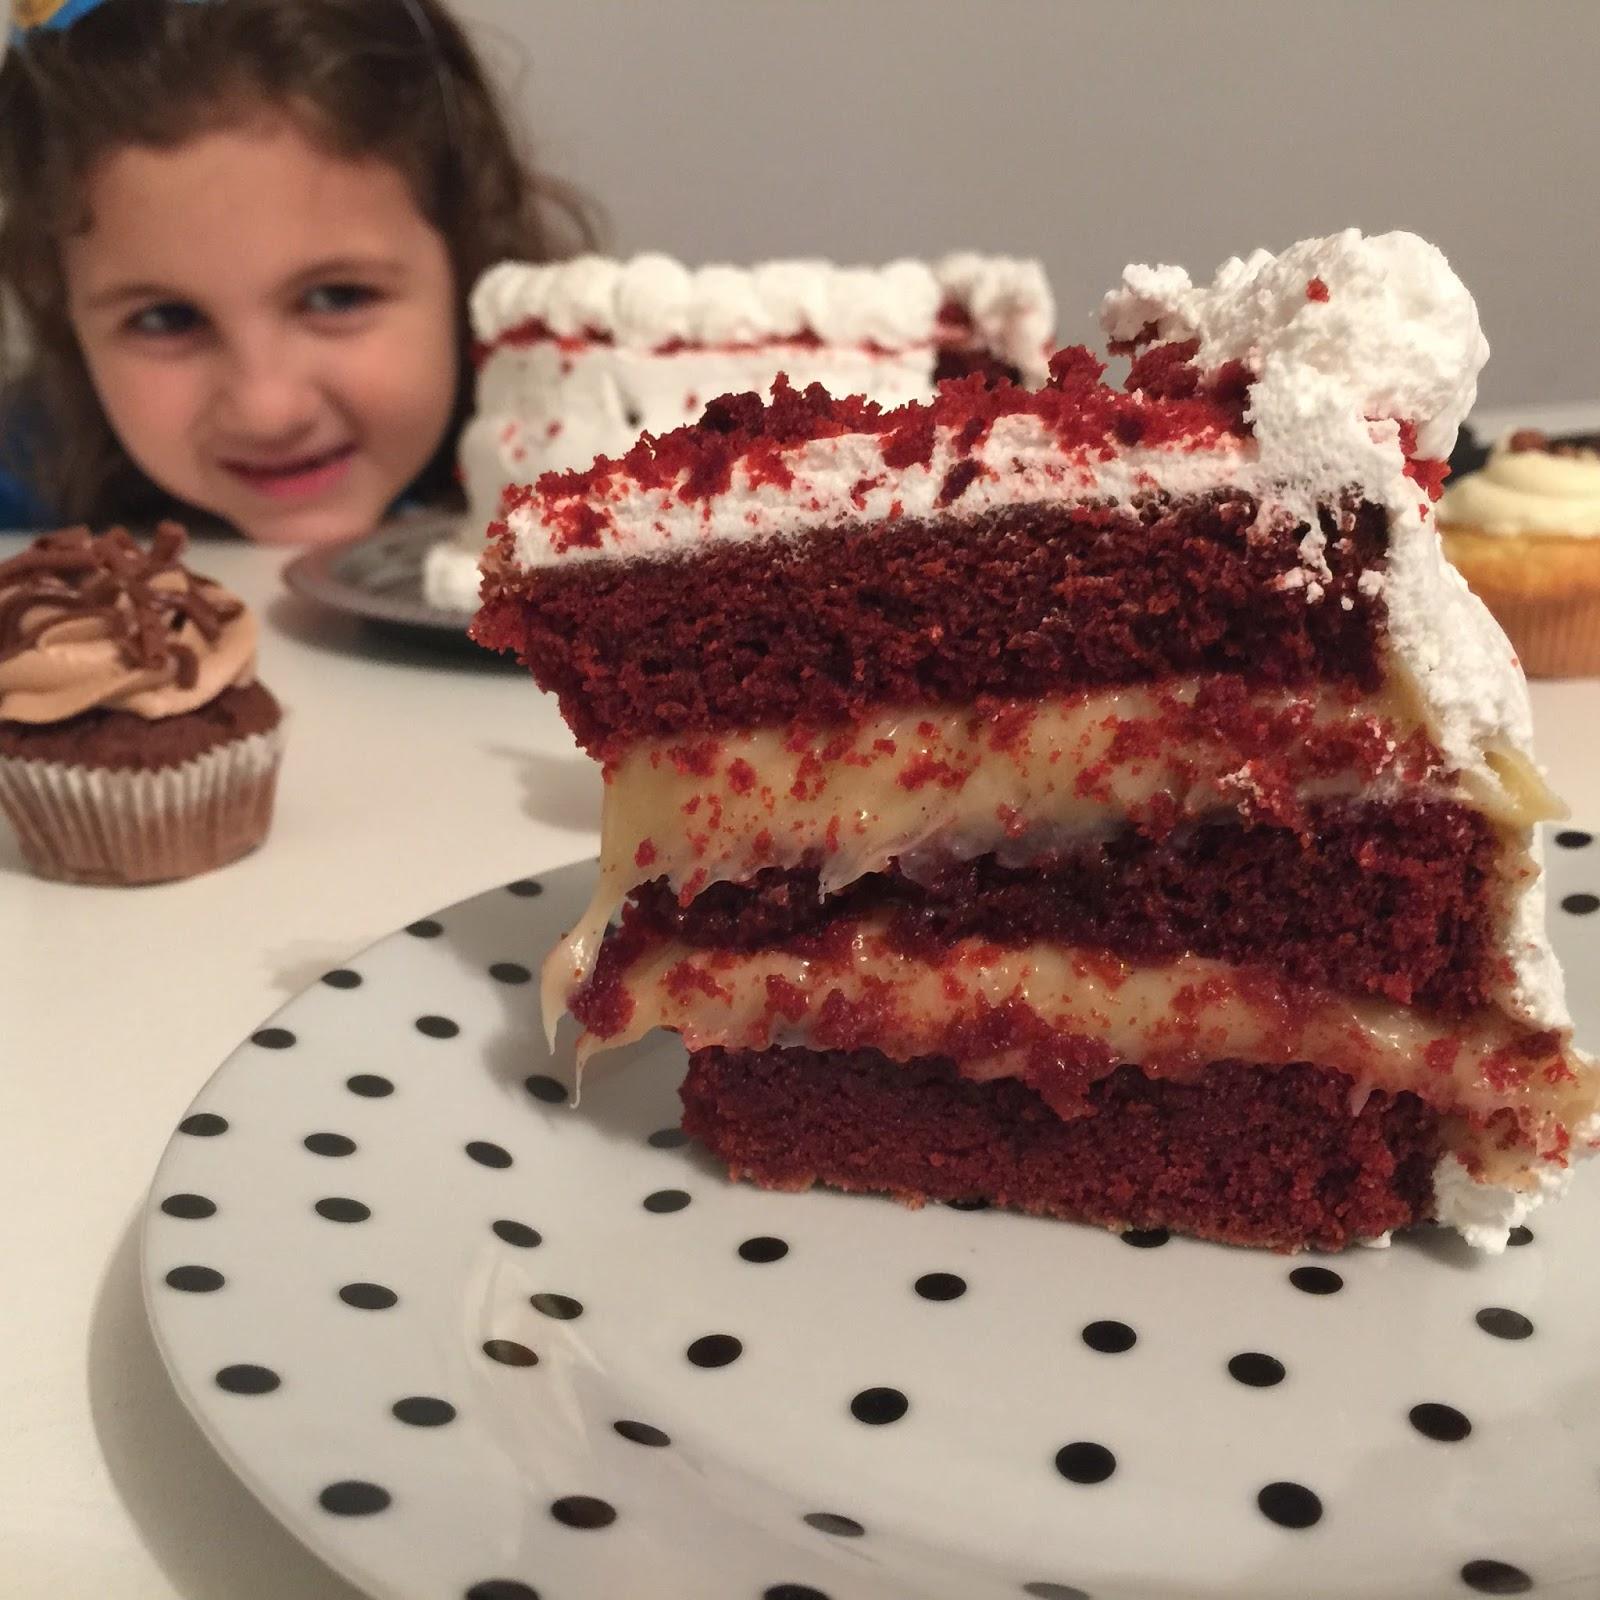 festa #GatocaFaz7 bolo red velvet /cupcakes Sugar Bakery Curitiba ... blog Mamãe de Salto, todos os direitos reservados